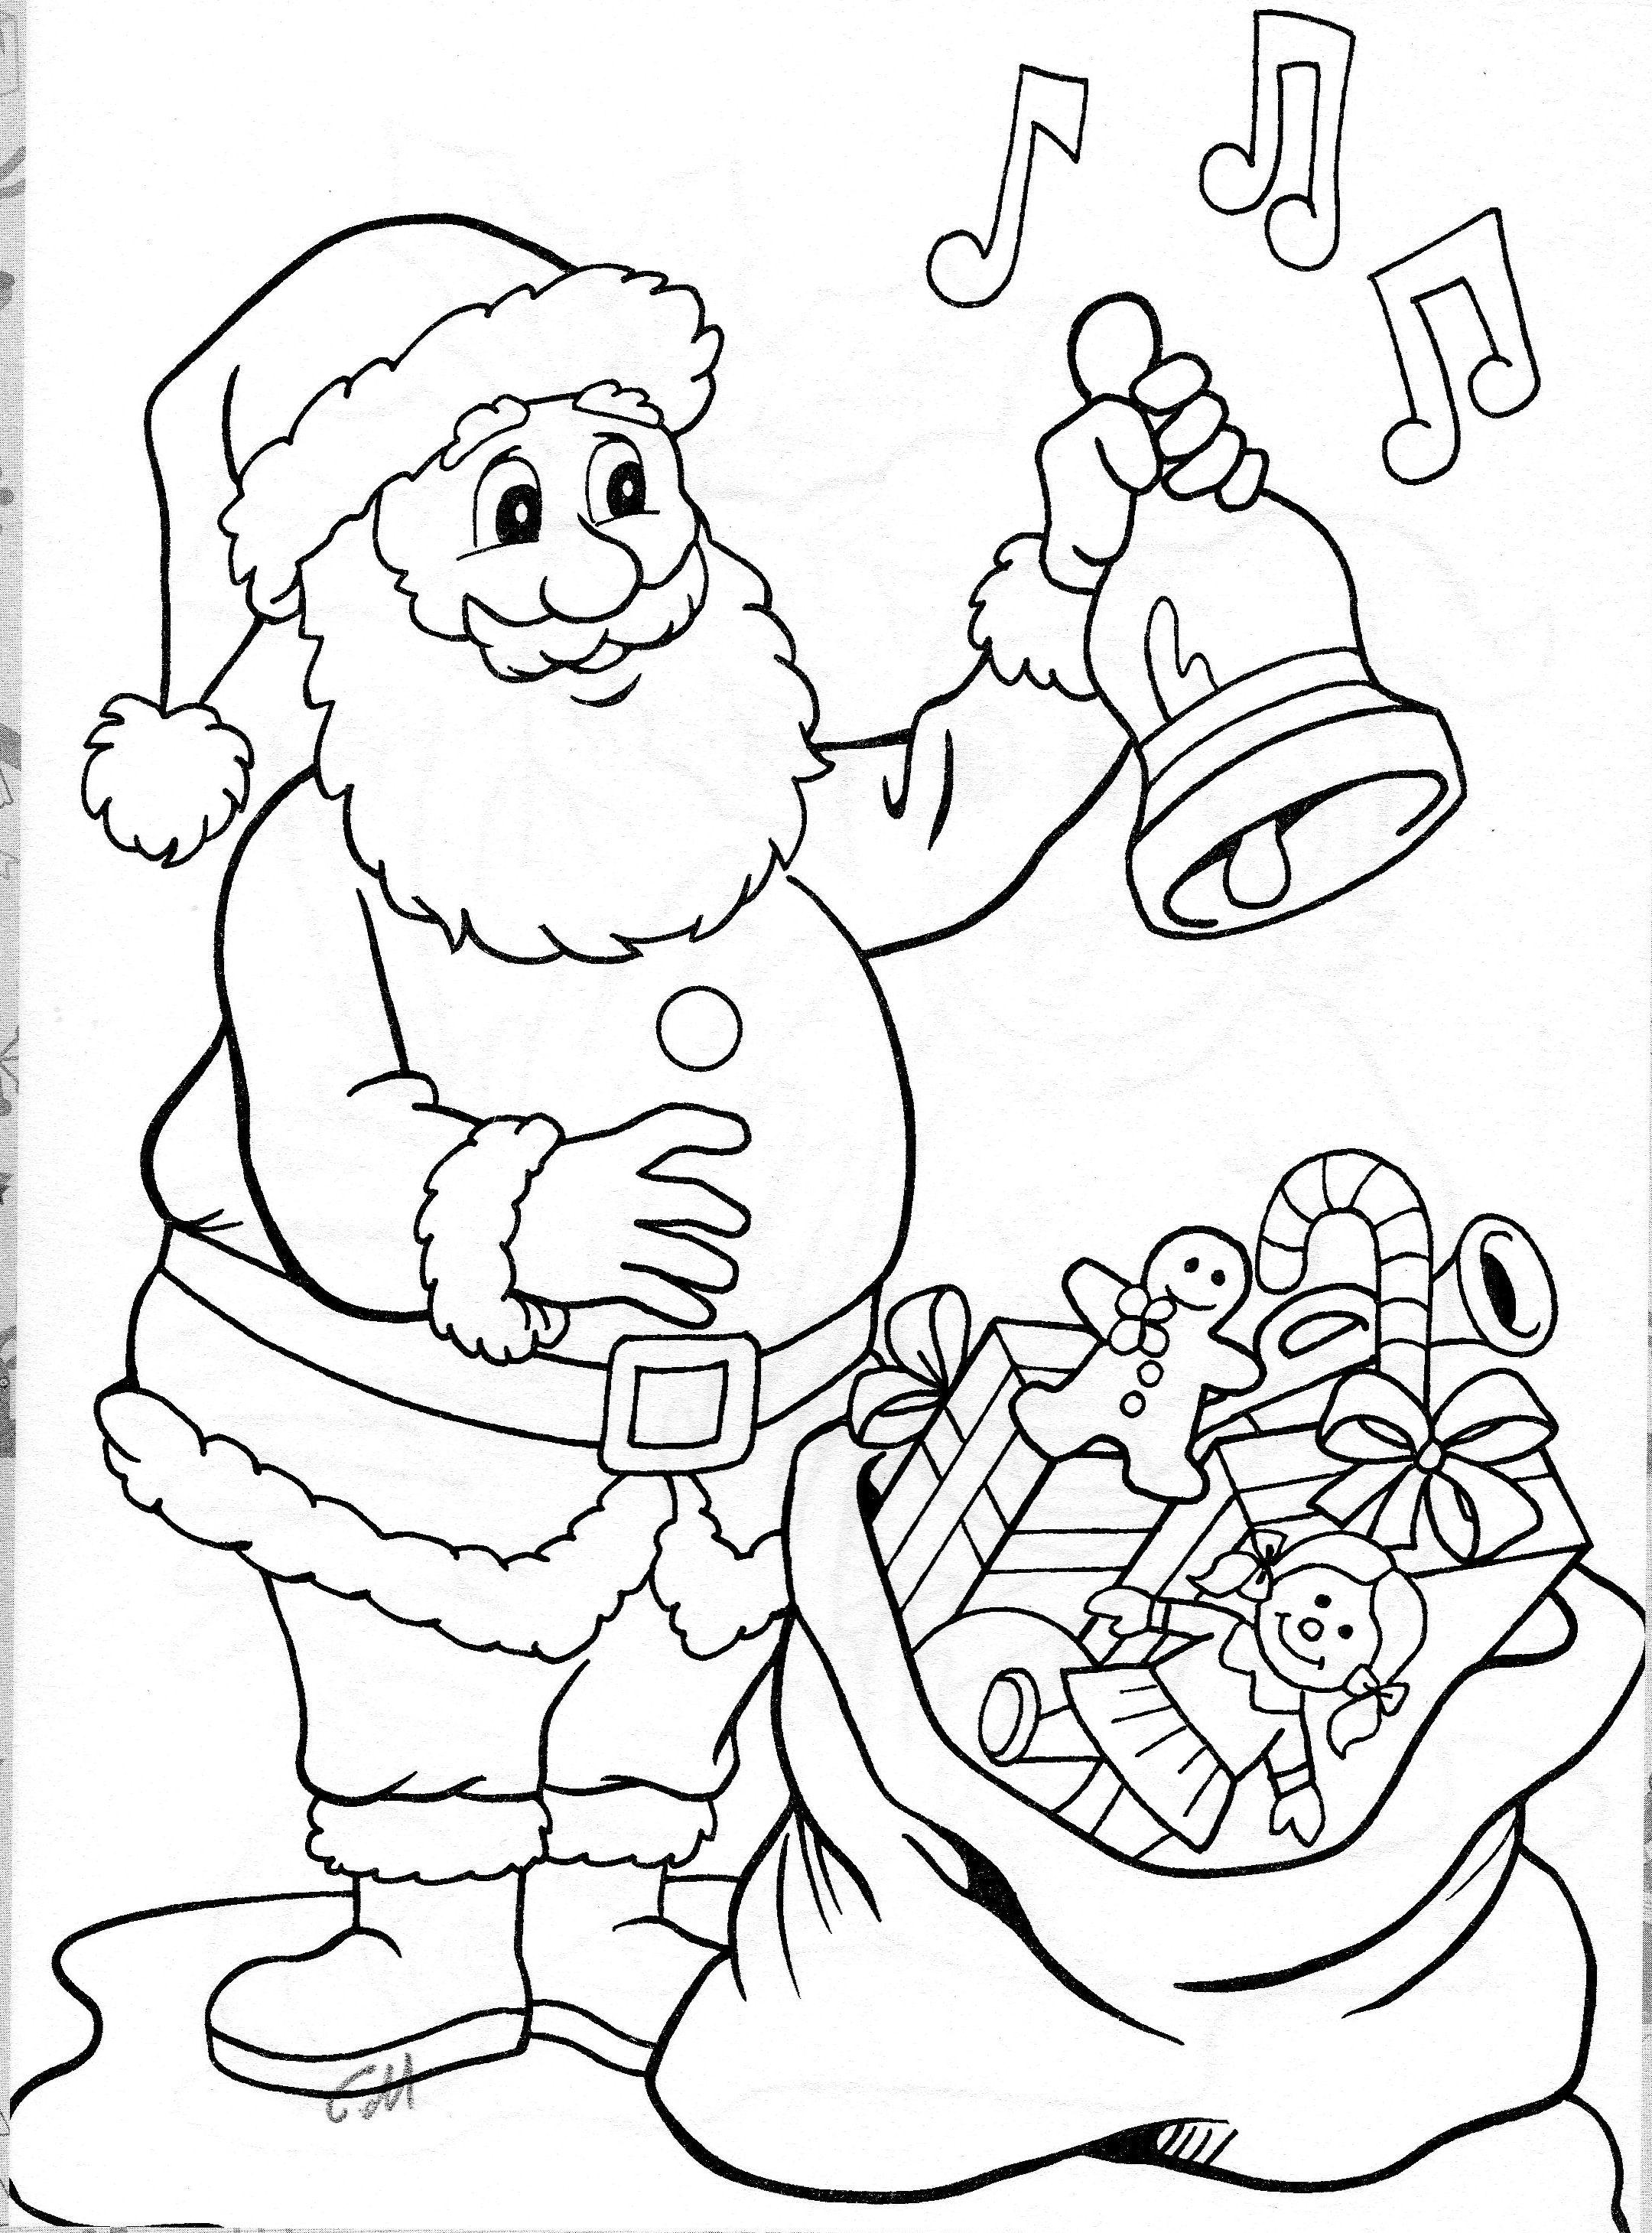 Pin de lorena en Navidad | Pinterest | Dibujos para pintar, Dibujos ...